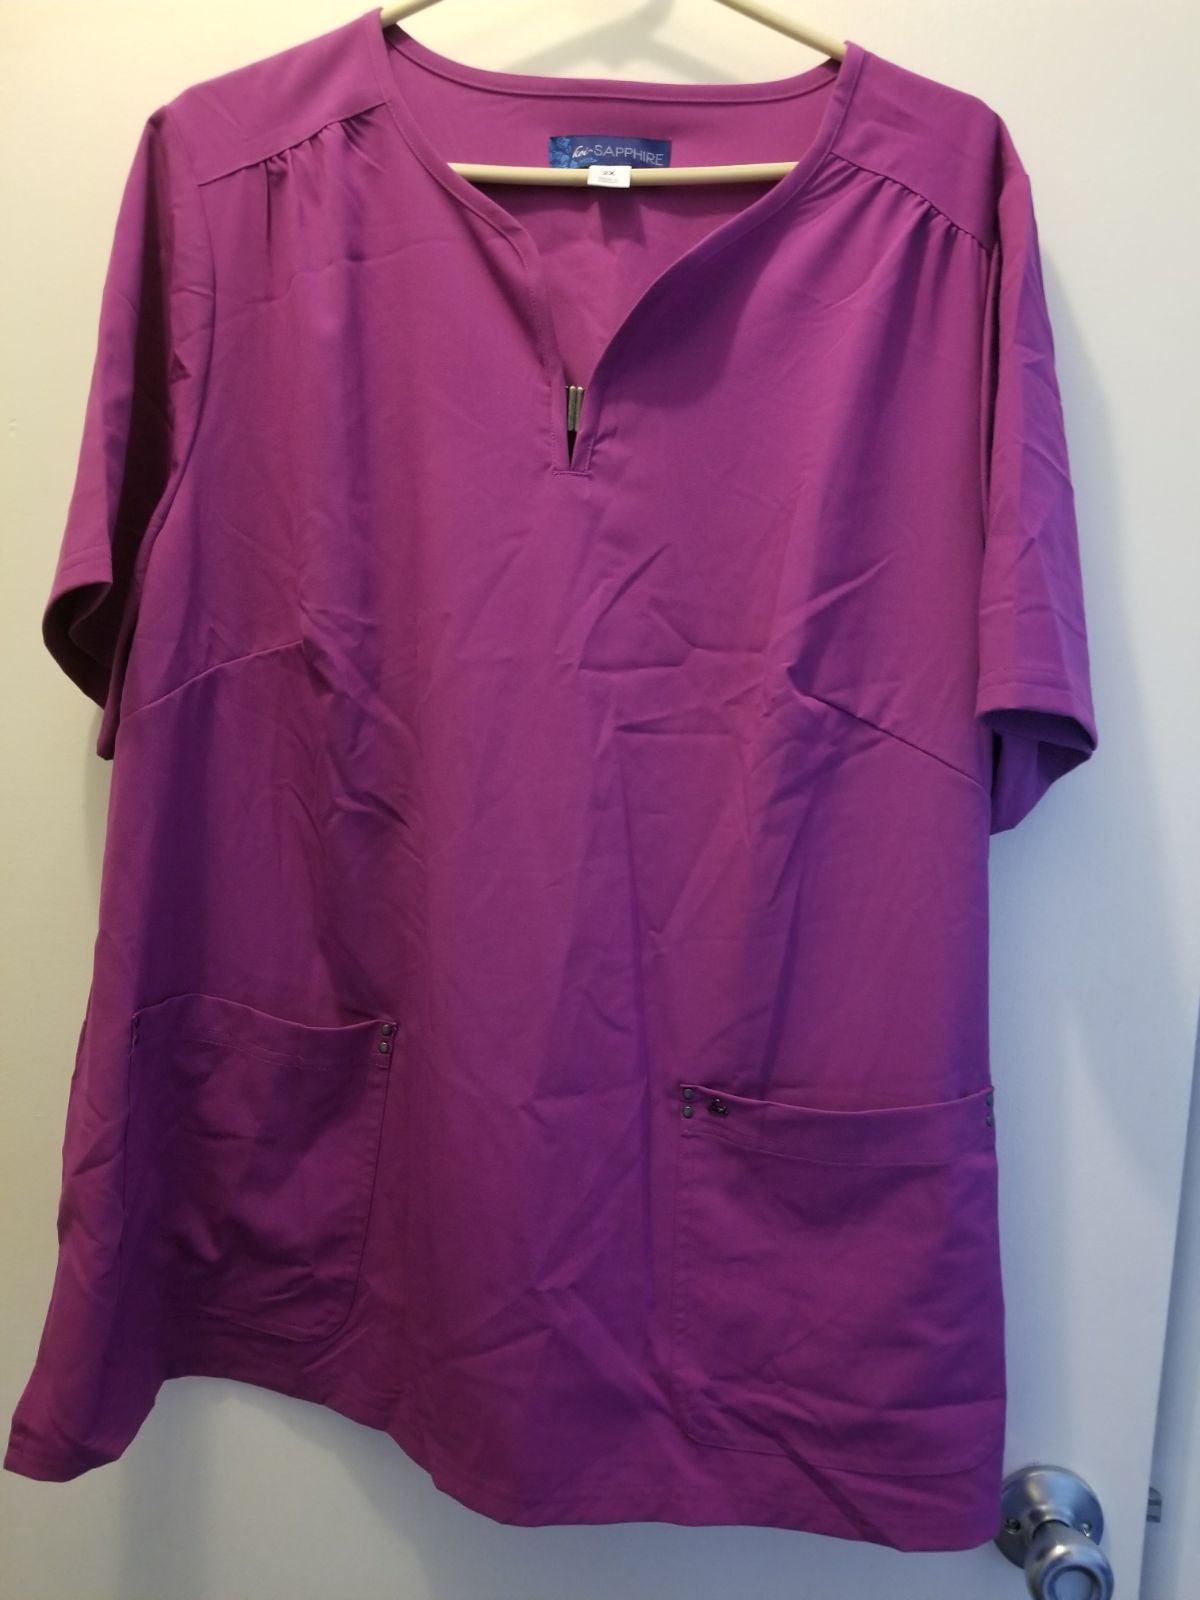 Koi Saphire scrub top 2X purple